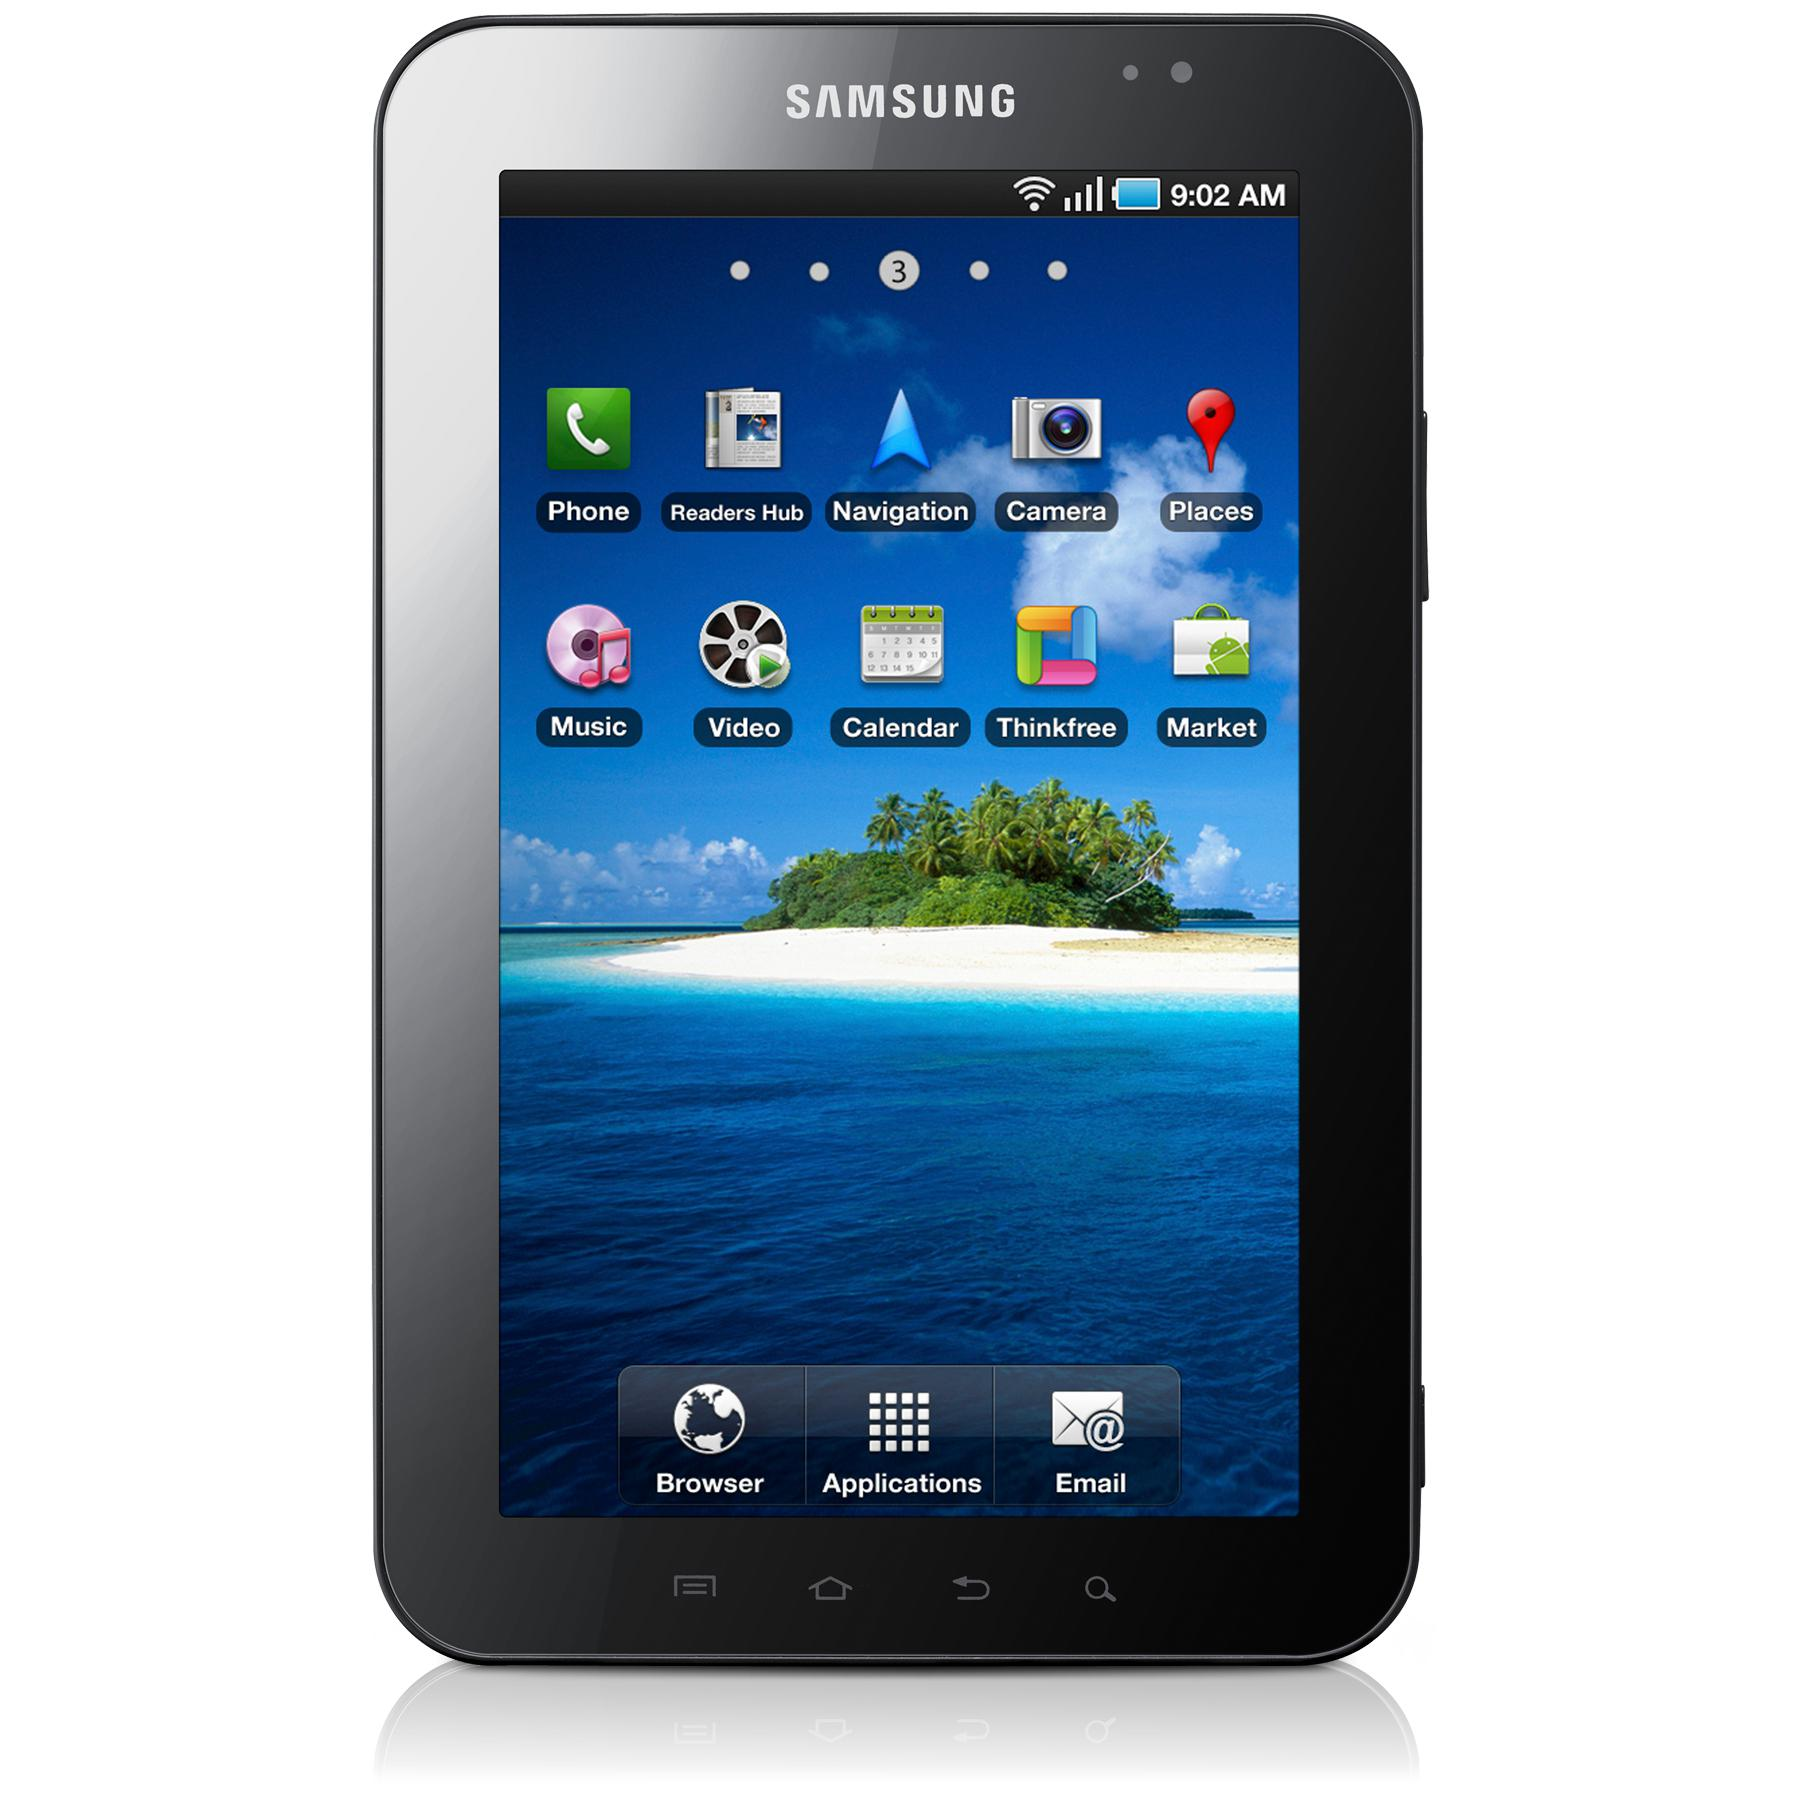 Galaxy Tab (2010) - WiFi